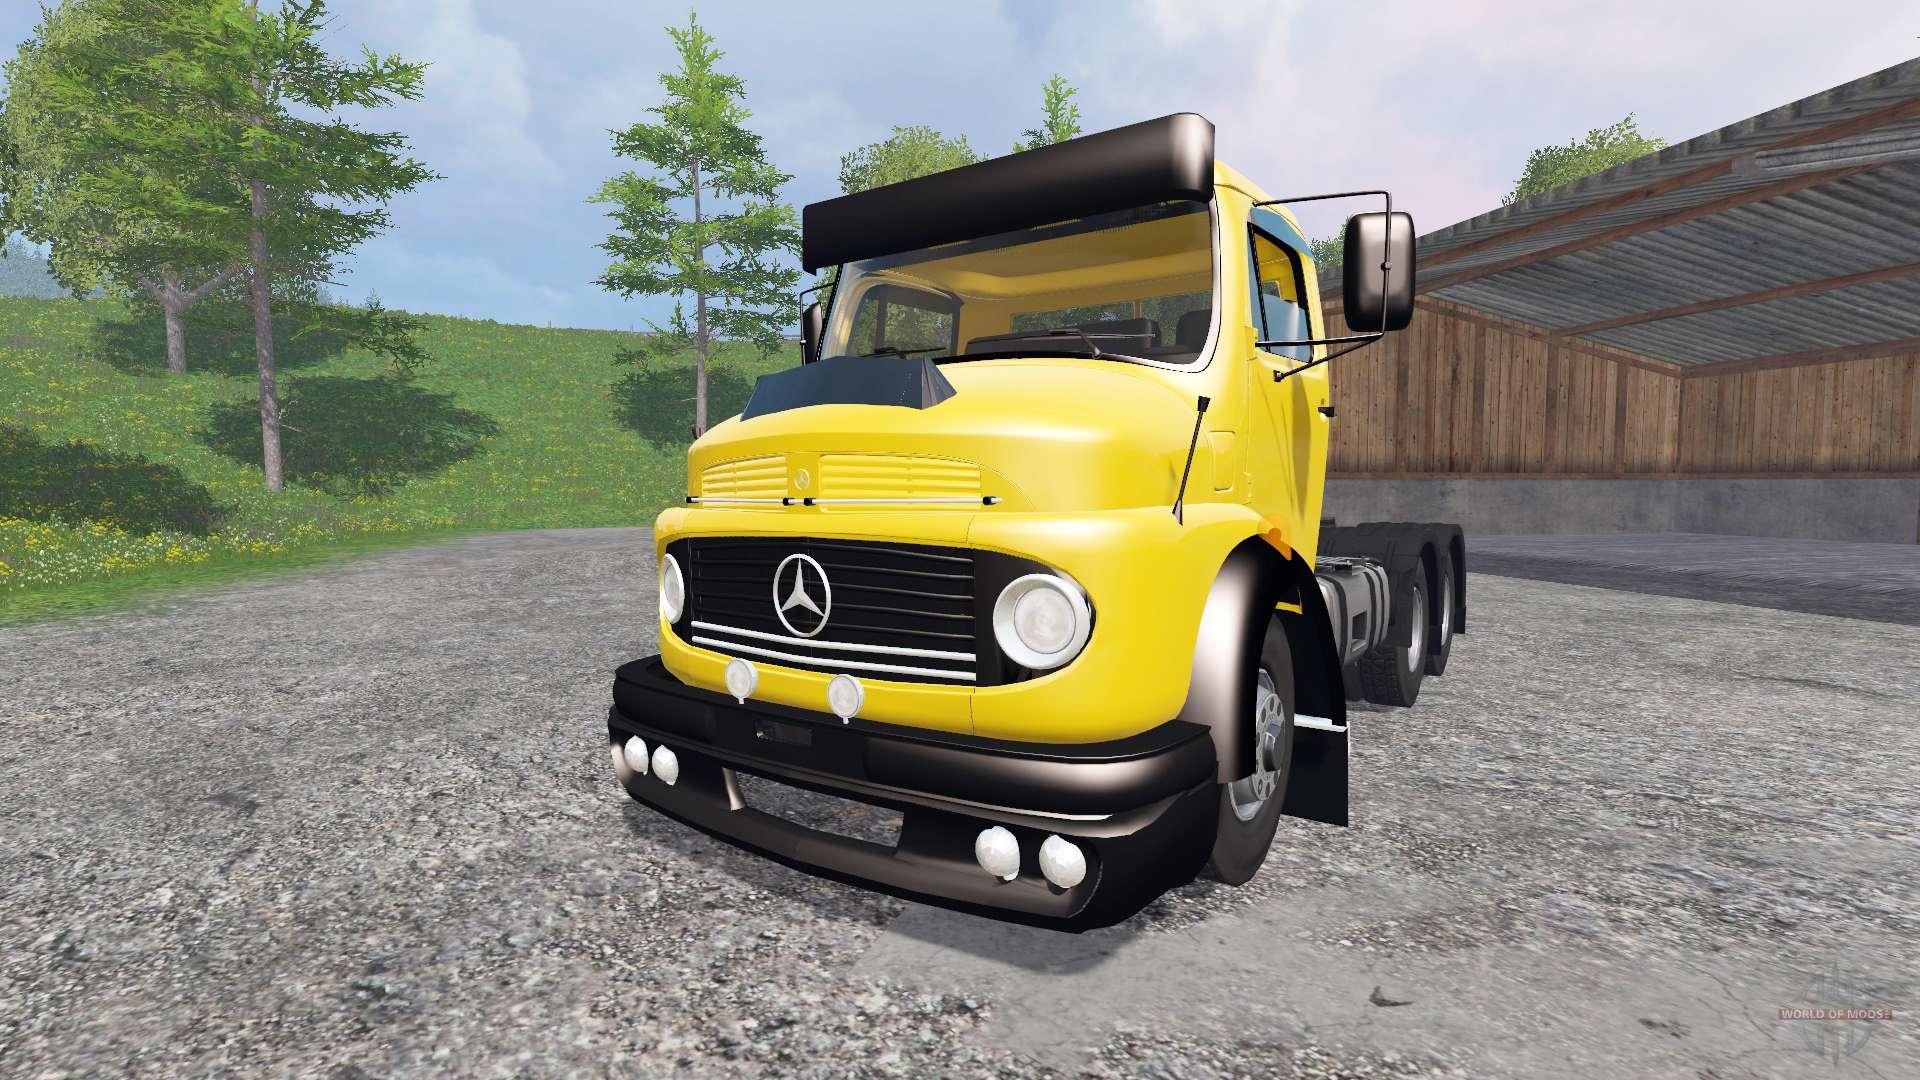 12753 Mercedes Benz 1114 on Tractor Truck